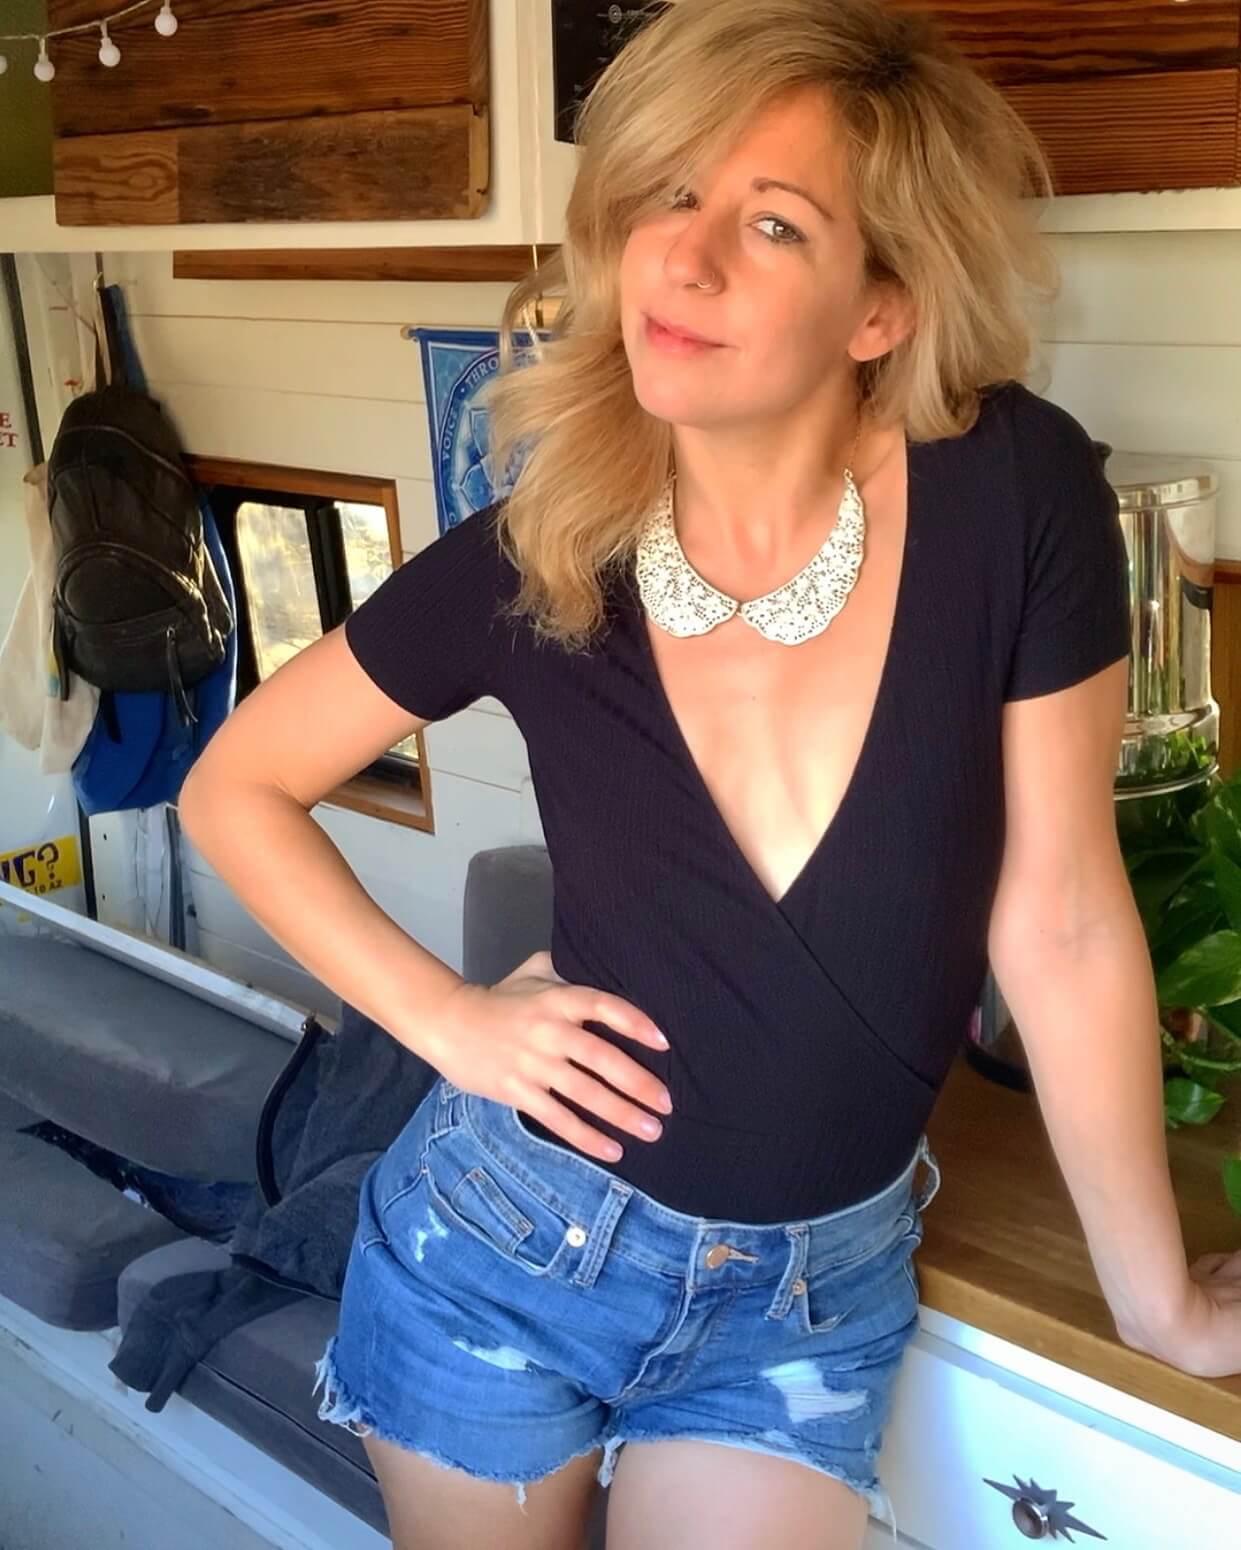 breast explant surgery fake boobs are toxic lisa jacobs vacay vans